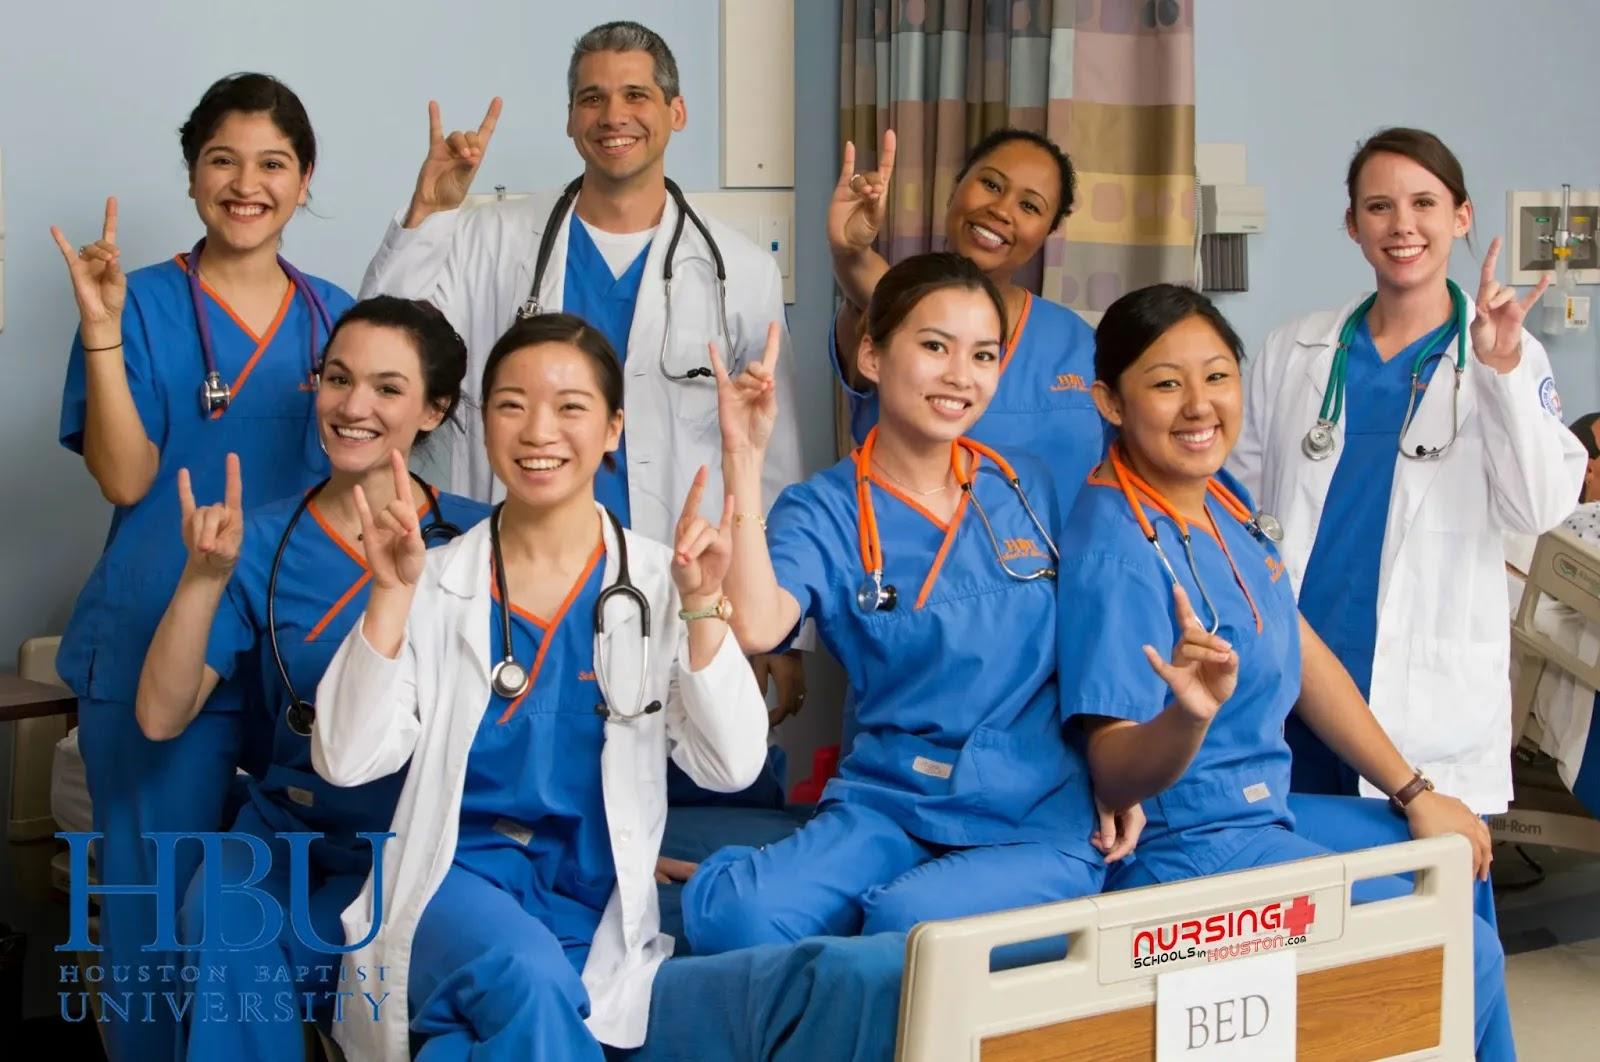 bsn nursing programs at houston baptist university in houston